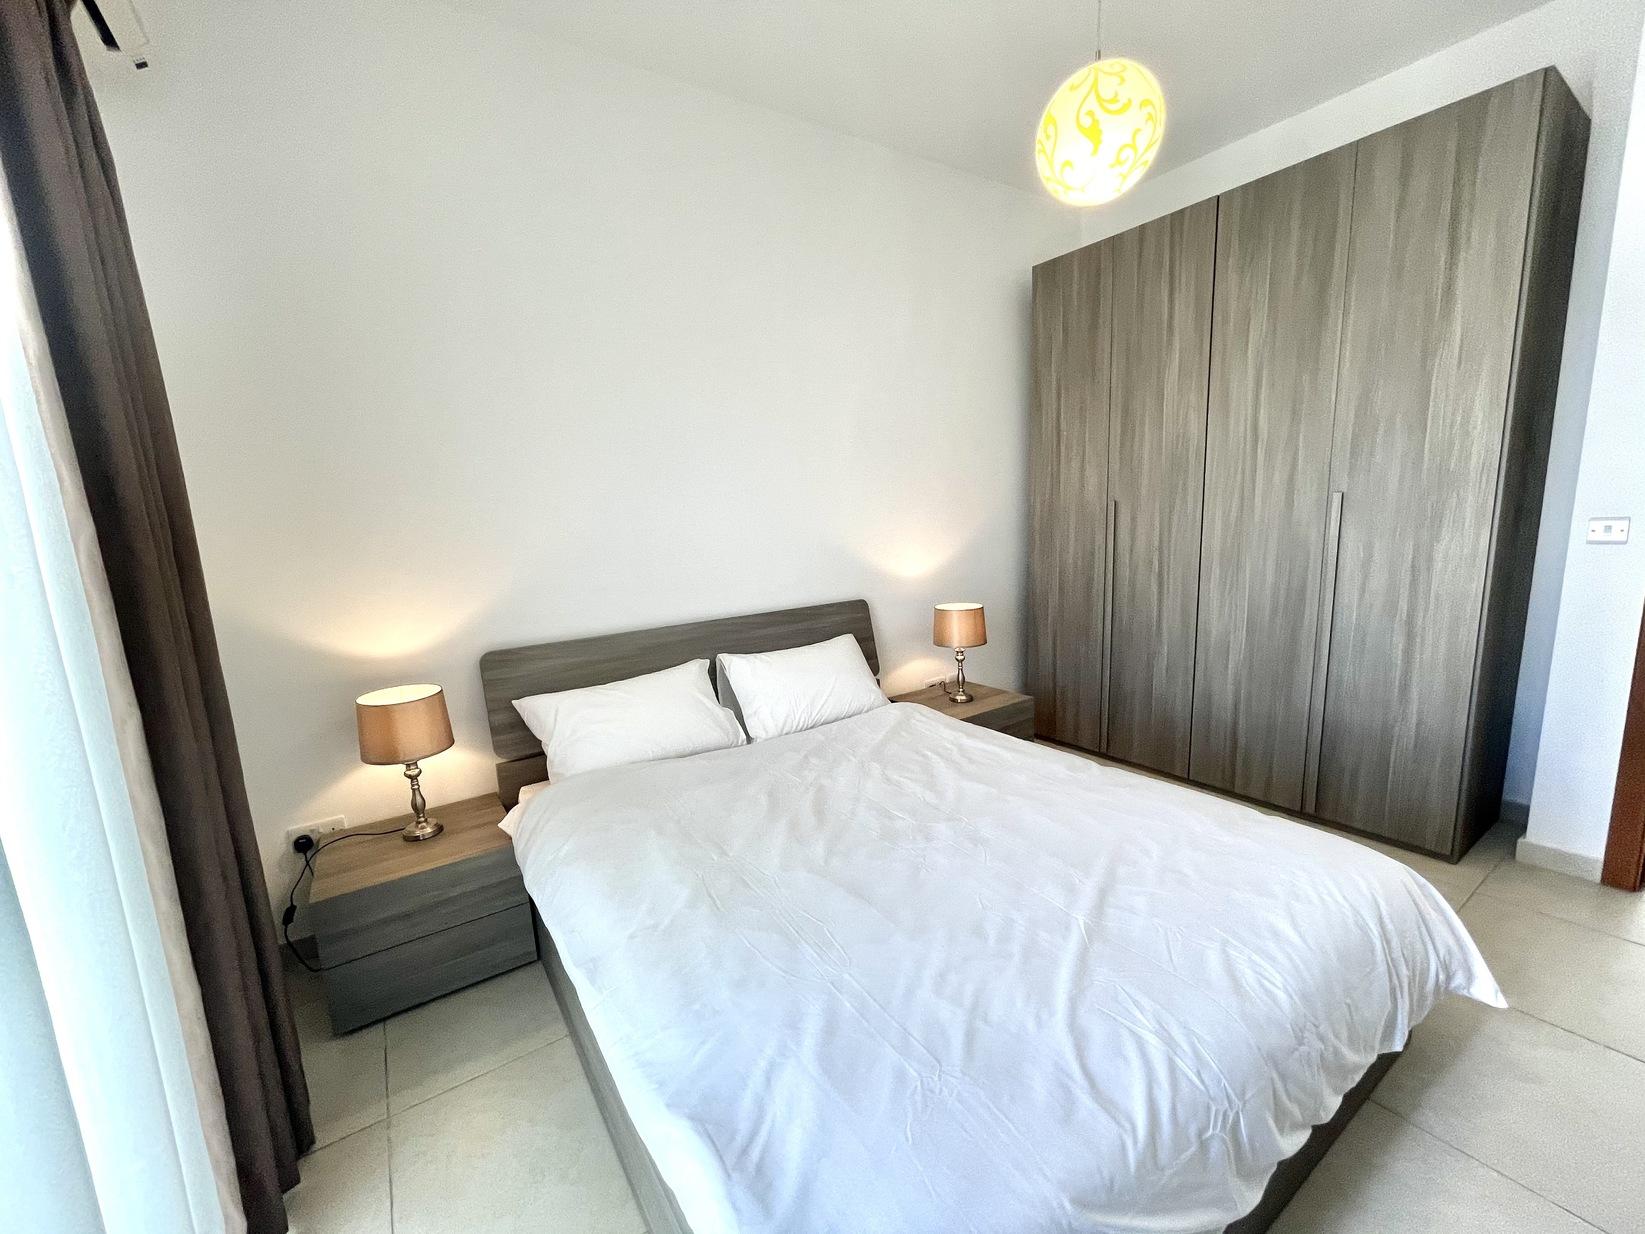 2 bed Penthouse For Rent in Gzira, Gzira - thumb 11